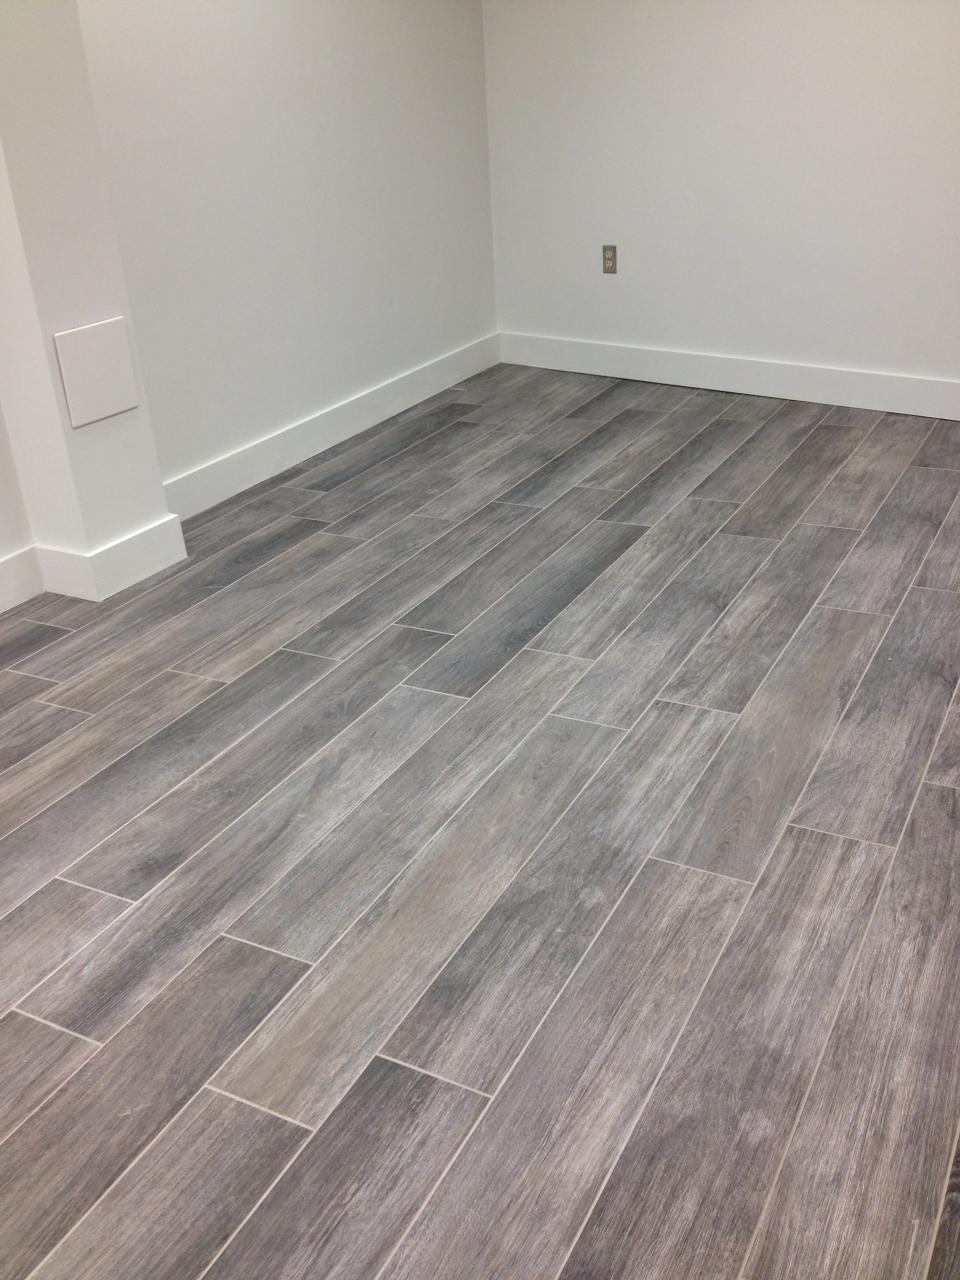 tile hardwood floor gray wood tile floor amazing tile ceramic tile wood floor transition CKZDPUA